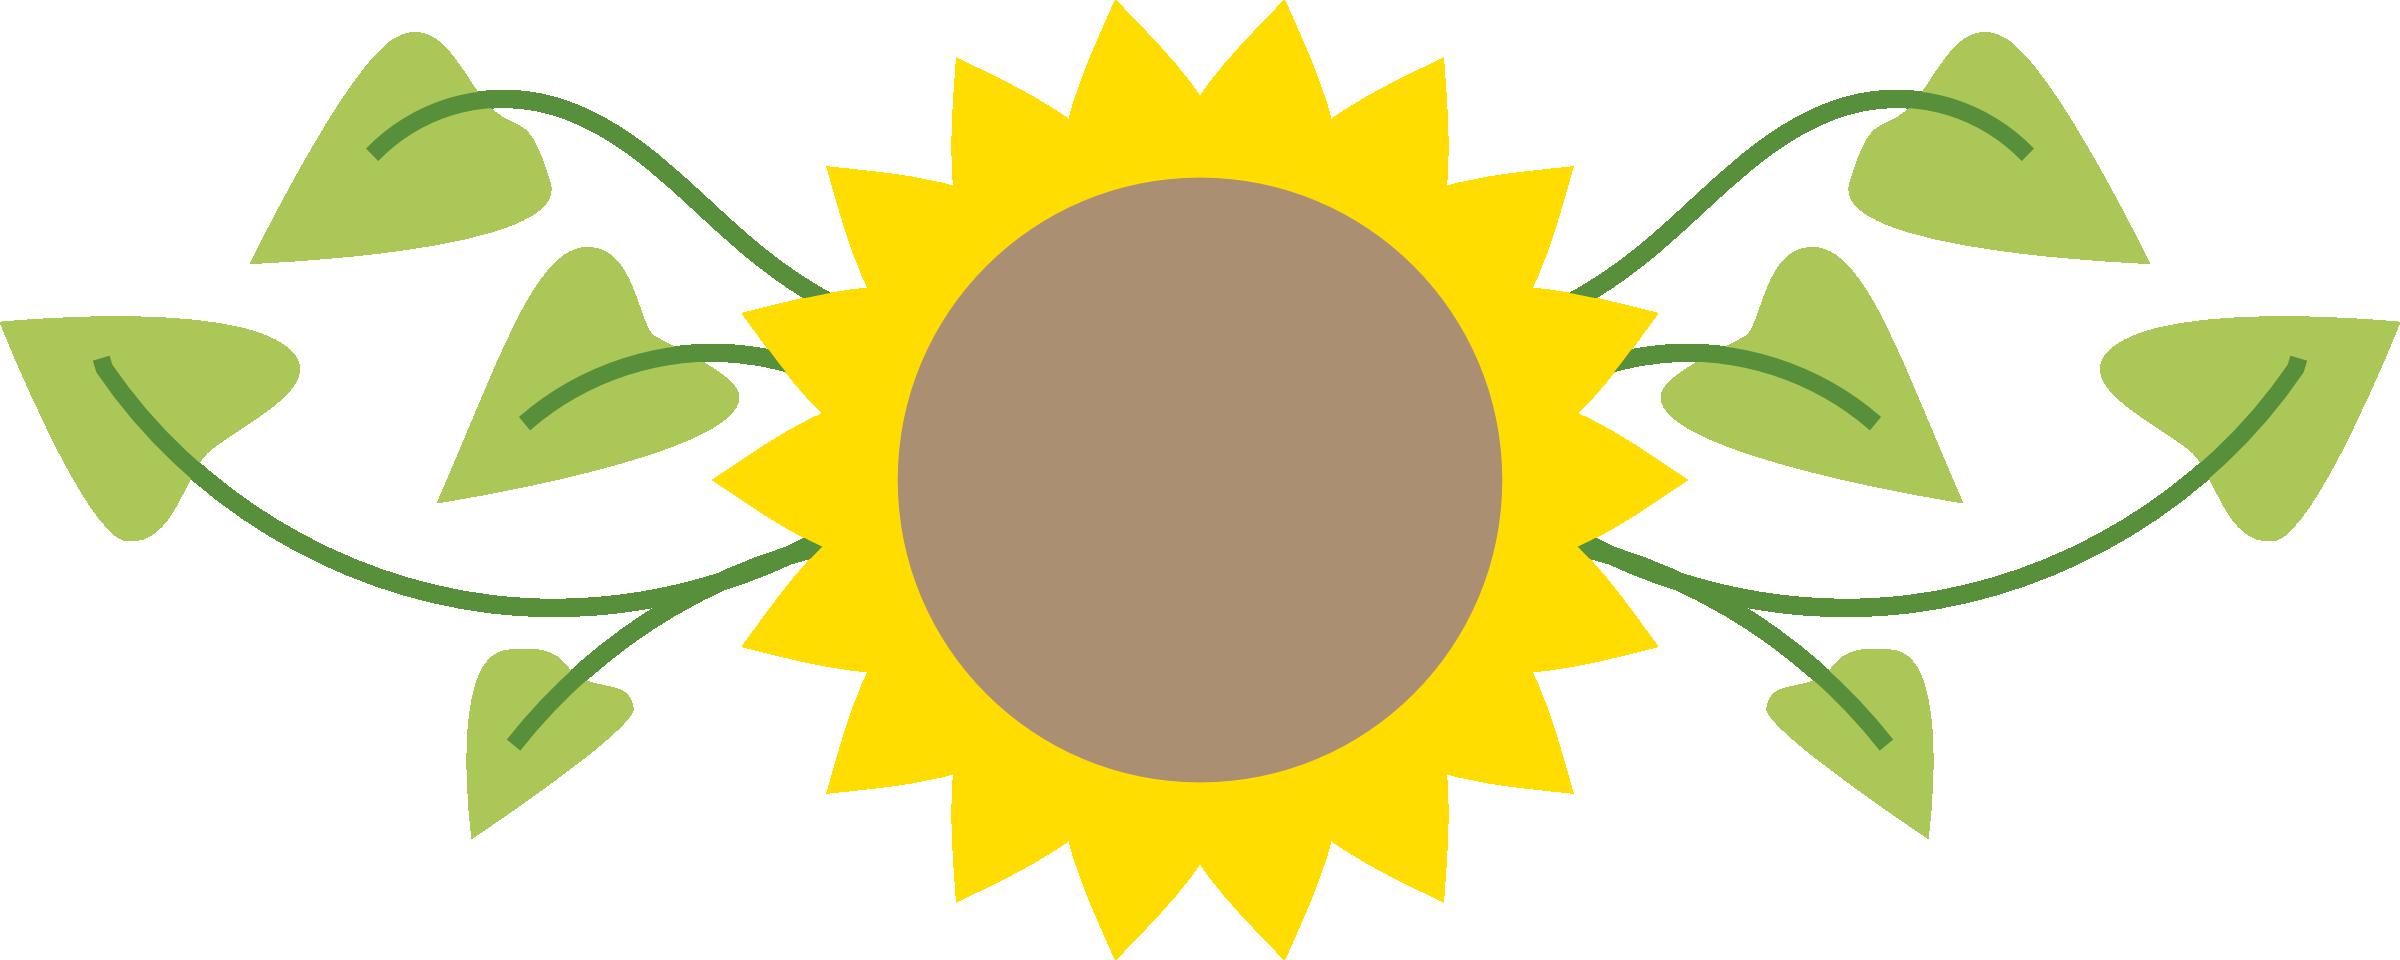 2400x960 Sun Clipart Divider